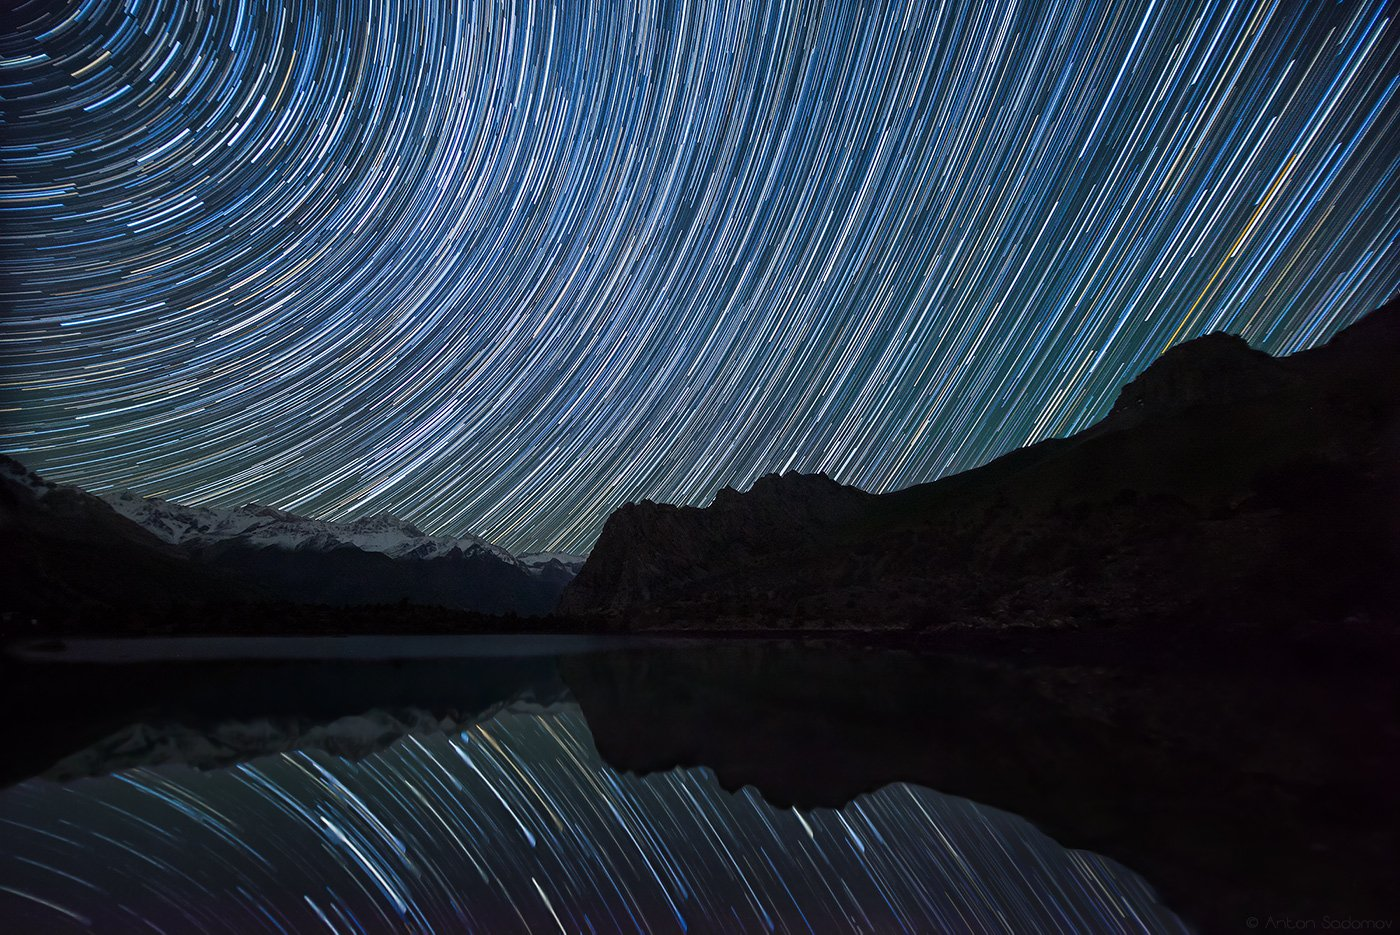 алаудины, озеро, таджикистан, ночь, звезды, Антон Садомов